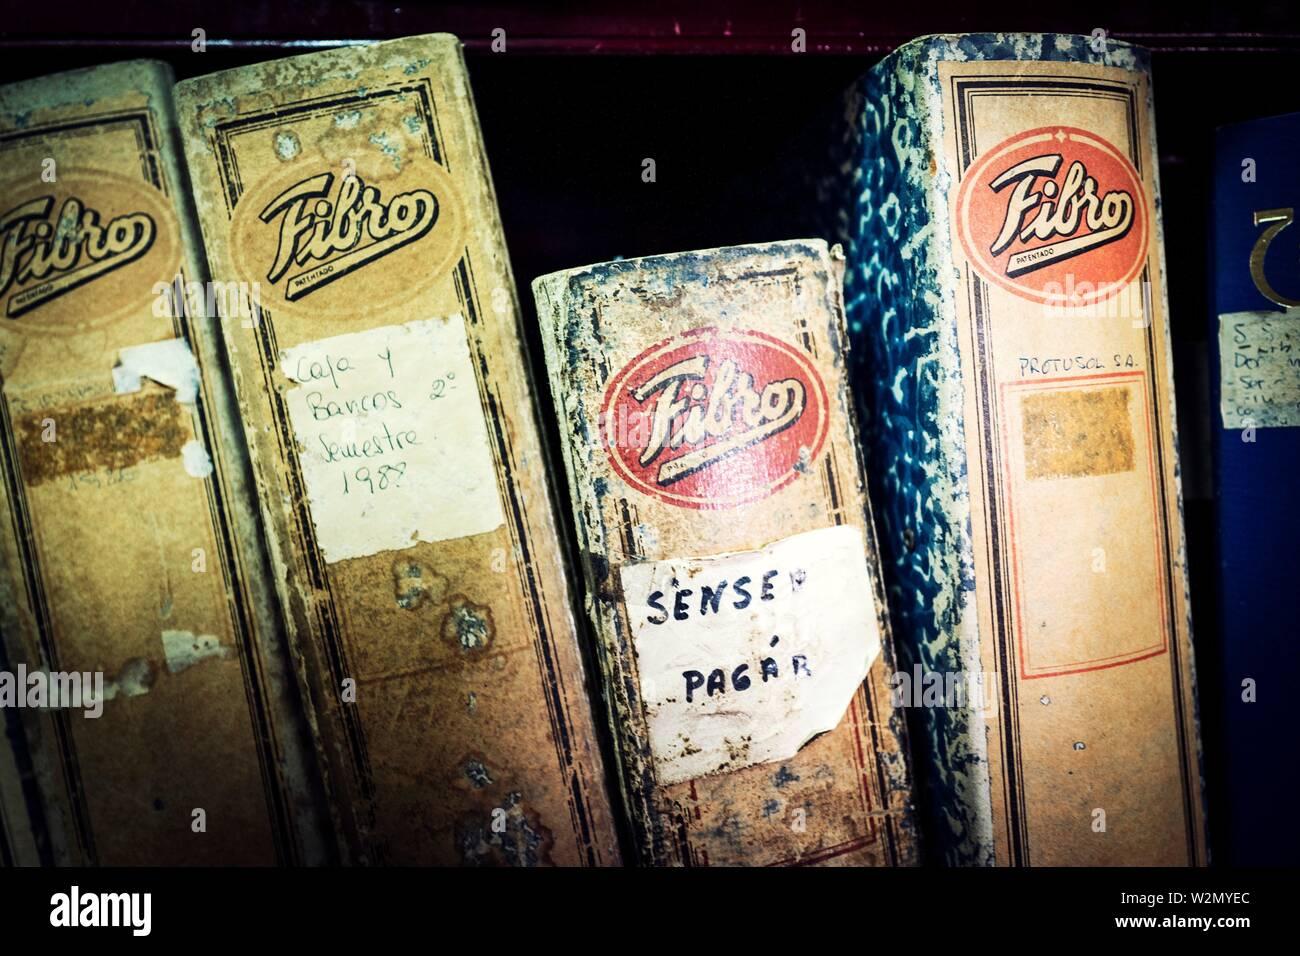 Close up of invoice folders on a shelf. Mahon, Balearic Islands, Spain, Europe. - Stock Image